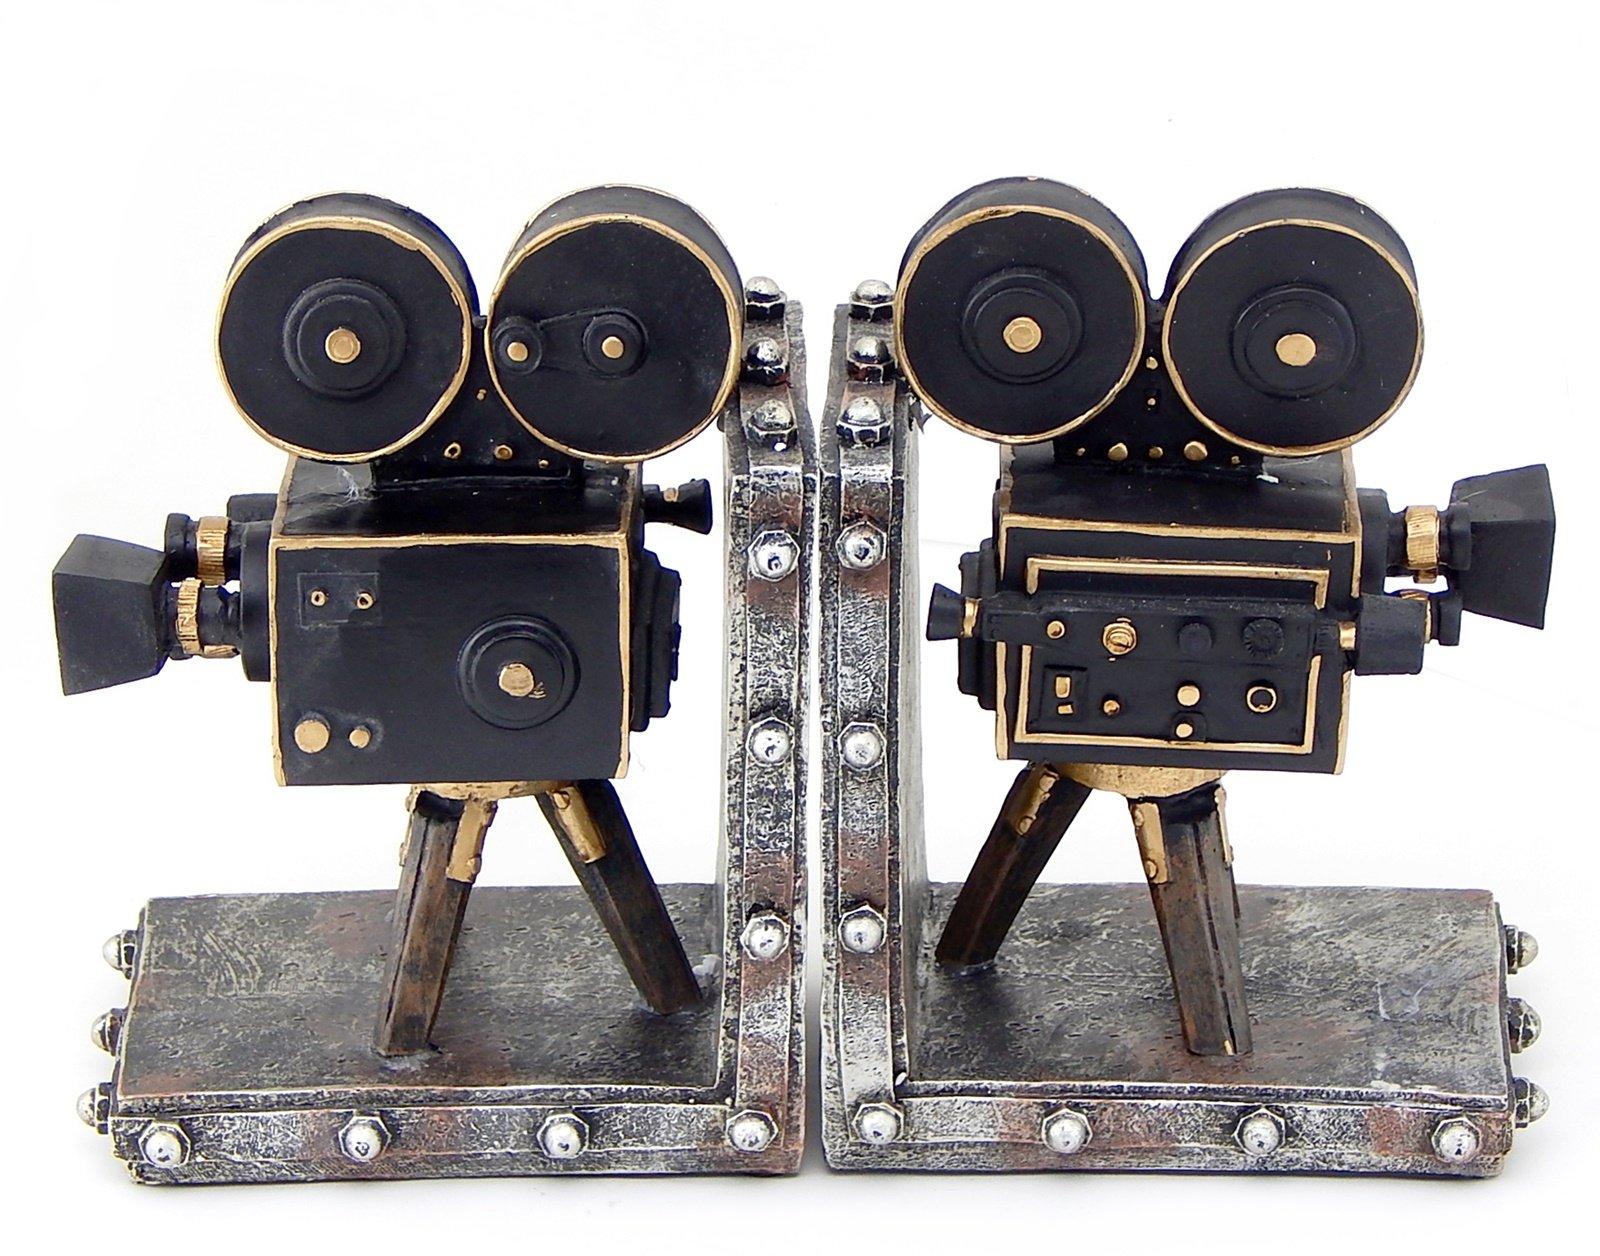 Bellaa 26287 Camera Bookend Set Vintage Old-Style Movie Film